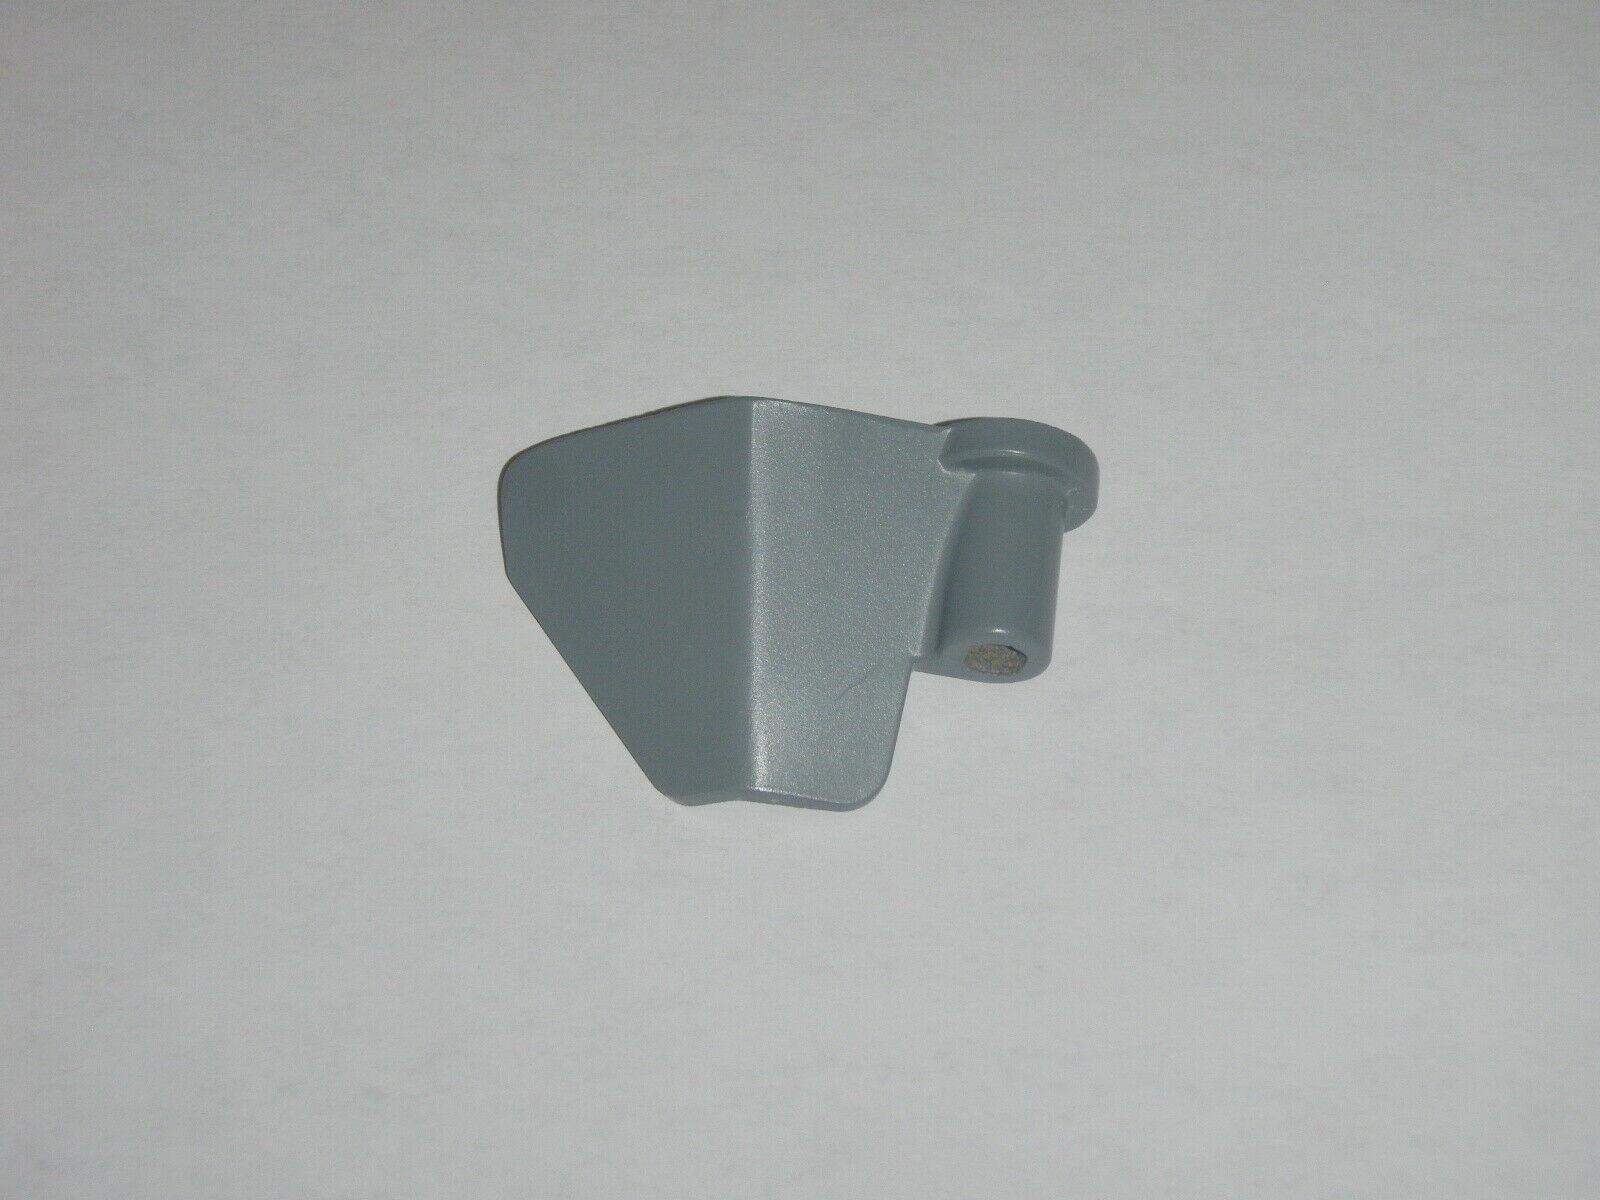 Farberware Bread Maker Machine Original Paddle for Models FTR700 (OEM) FTR700DL image 4